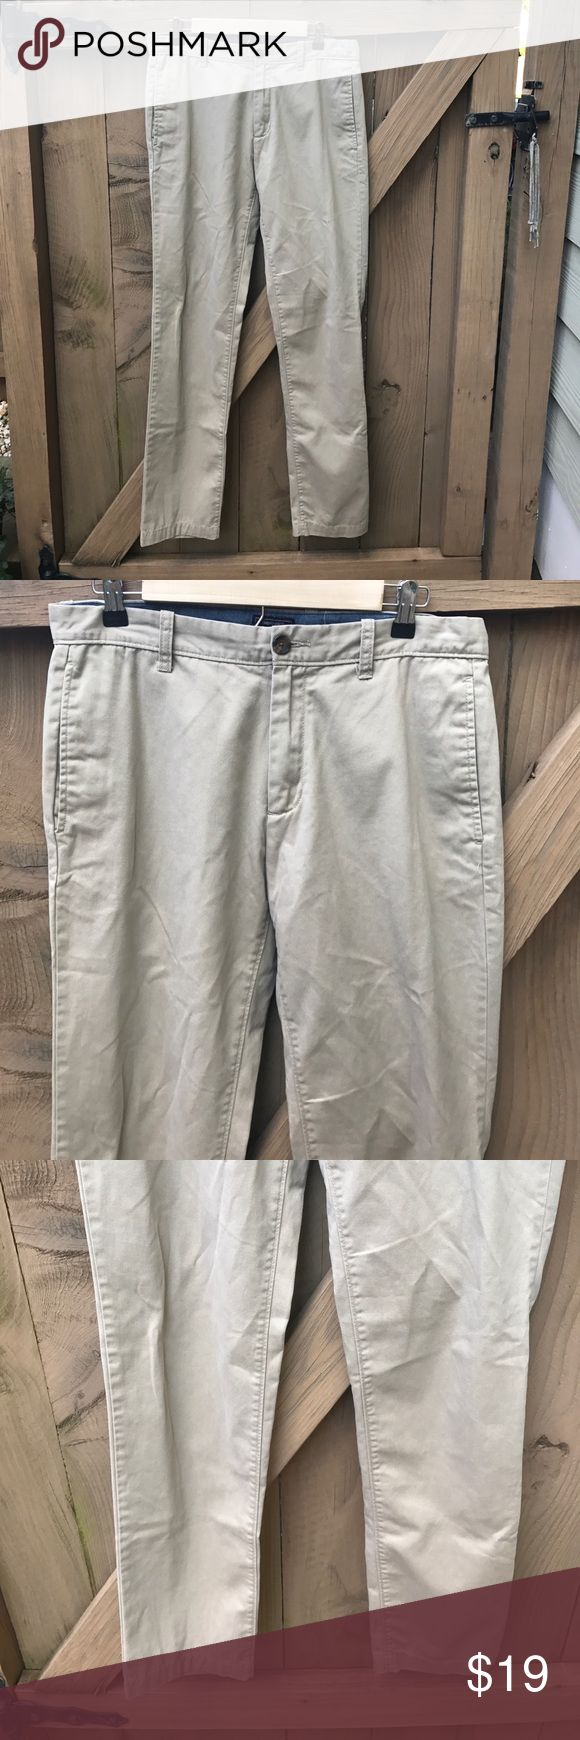 Size 32/34 Gap slim fit khaki pants Size 32/34 Gap slim fit khaki pants: BIN 1 GAP Pants Chinos & Khakis